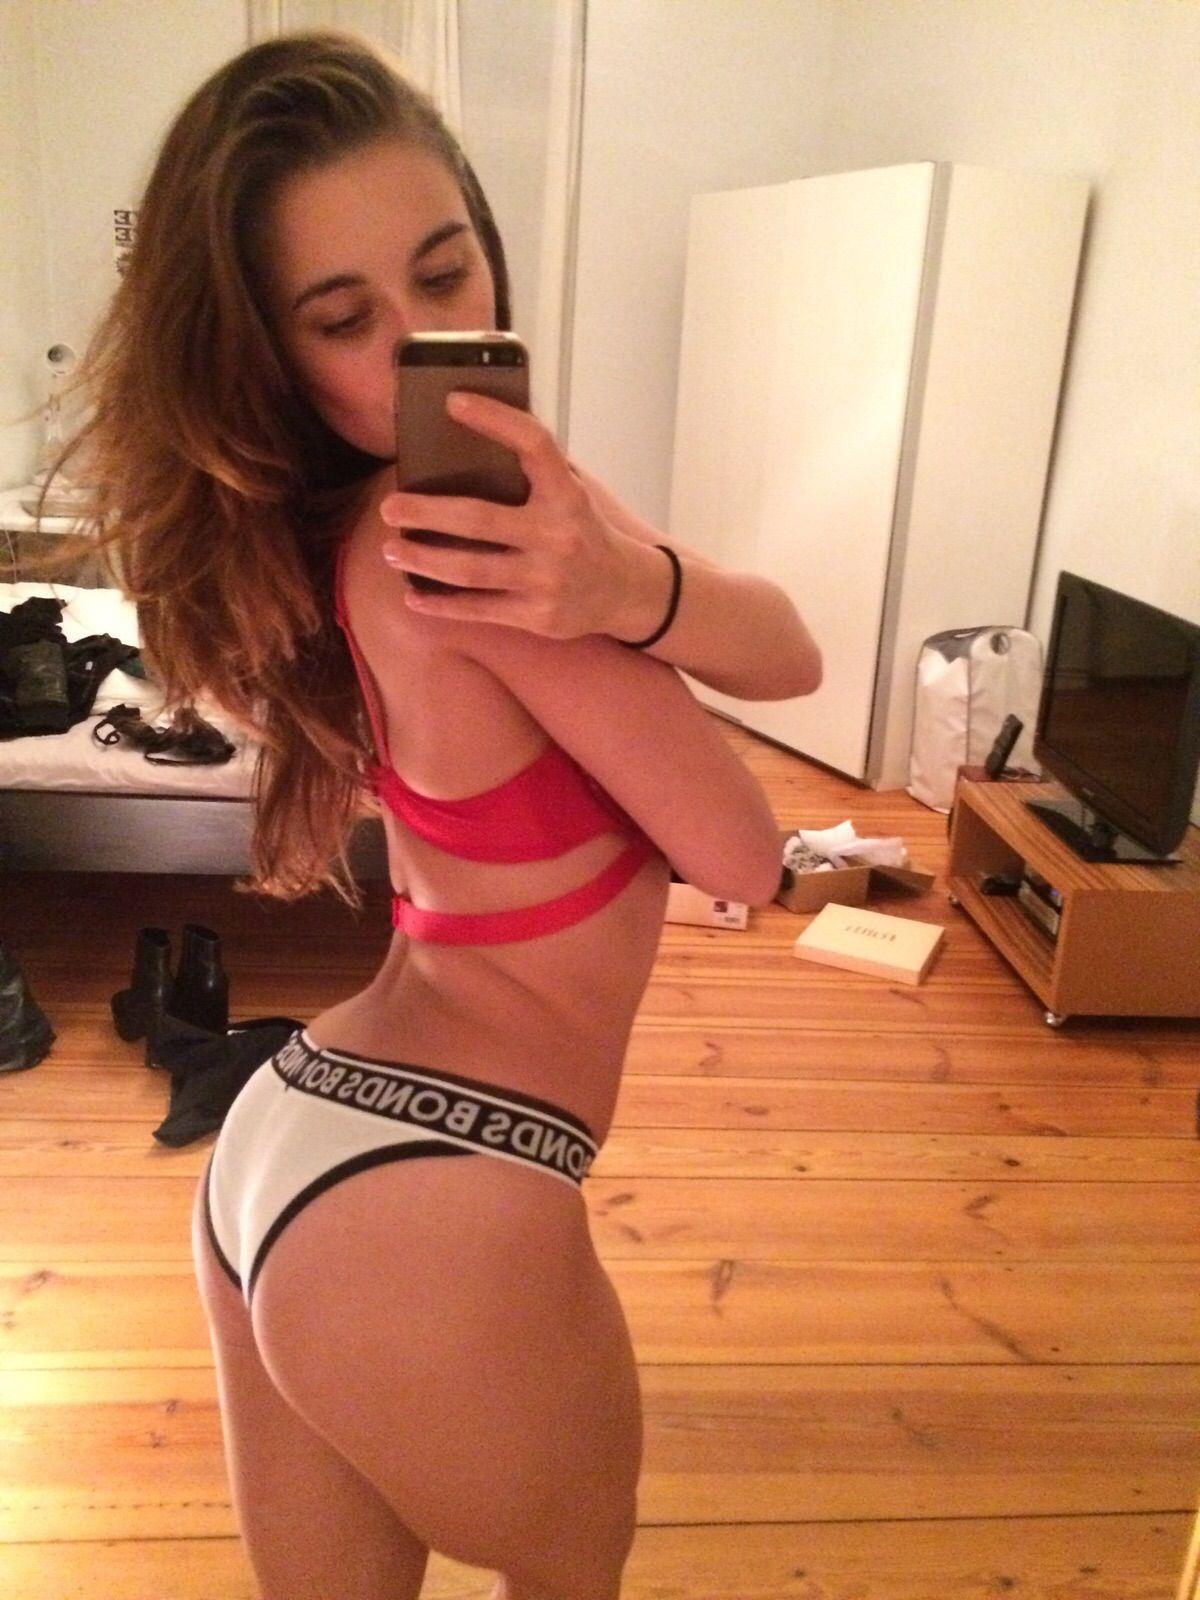 German Ballet Dancer Laura Kokinova nude leaked blowjob video